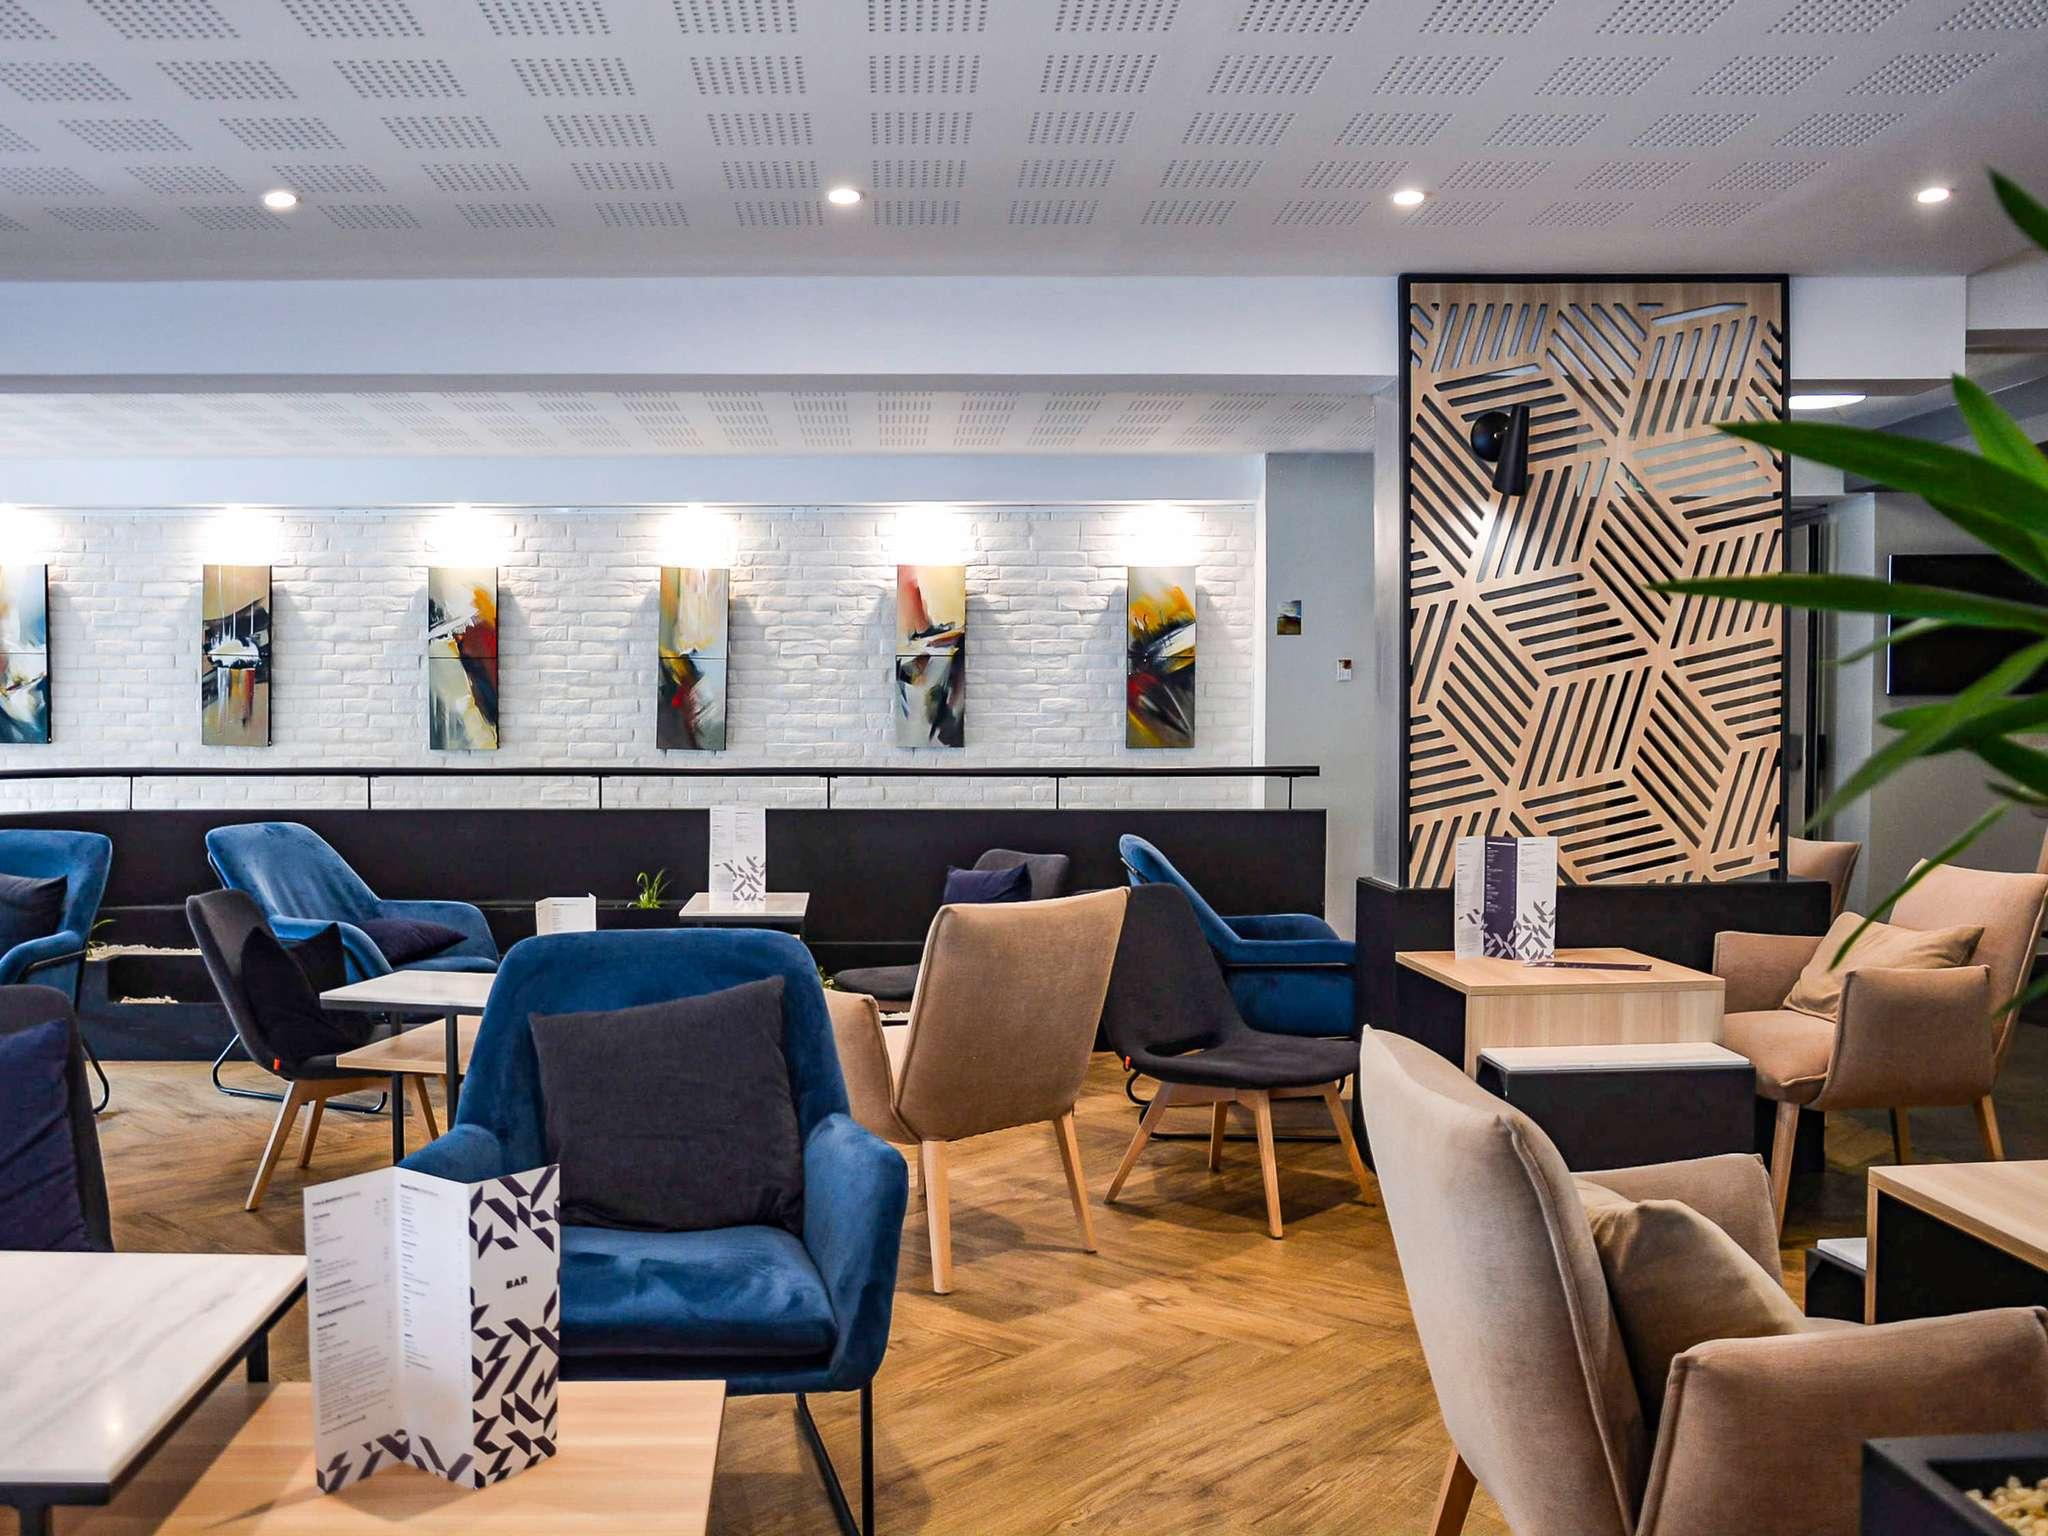 Hotel – Albergo Mercure Lorient Centre